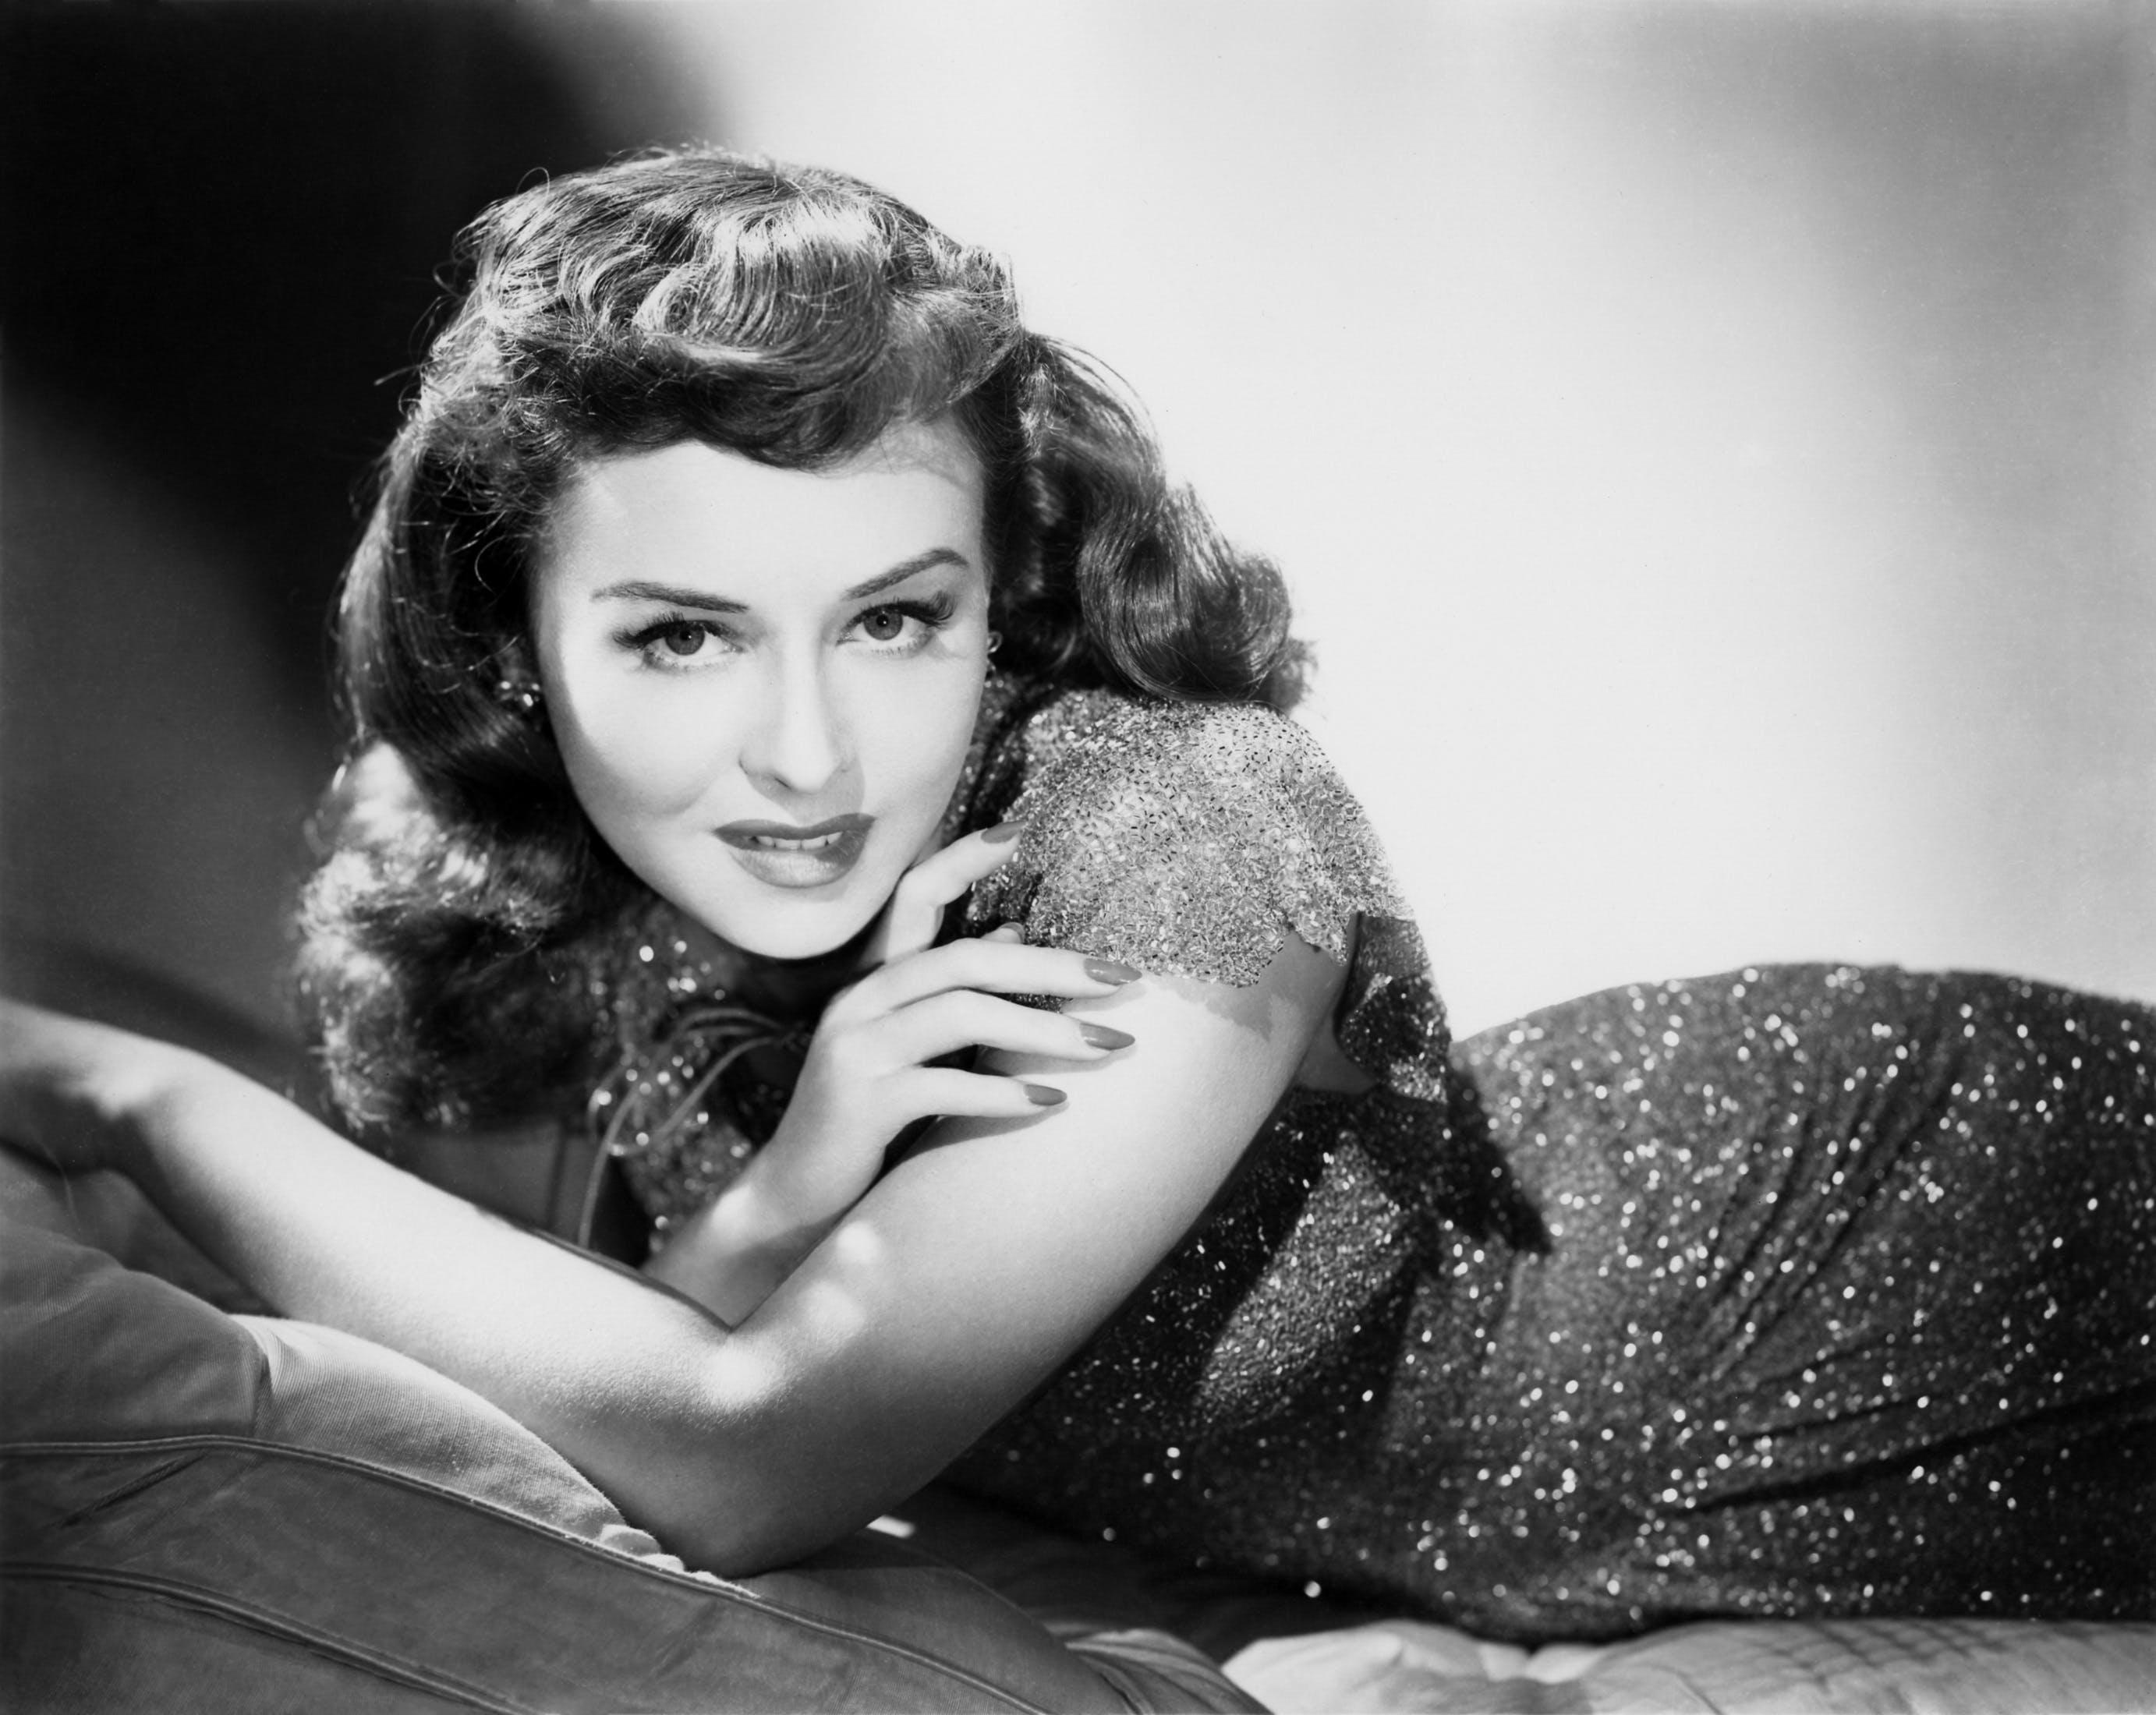 Free stock photo of black-and-white, woman, vintage, monochrome